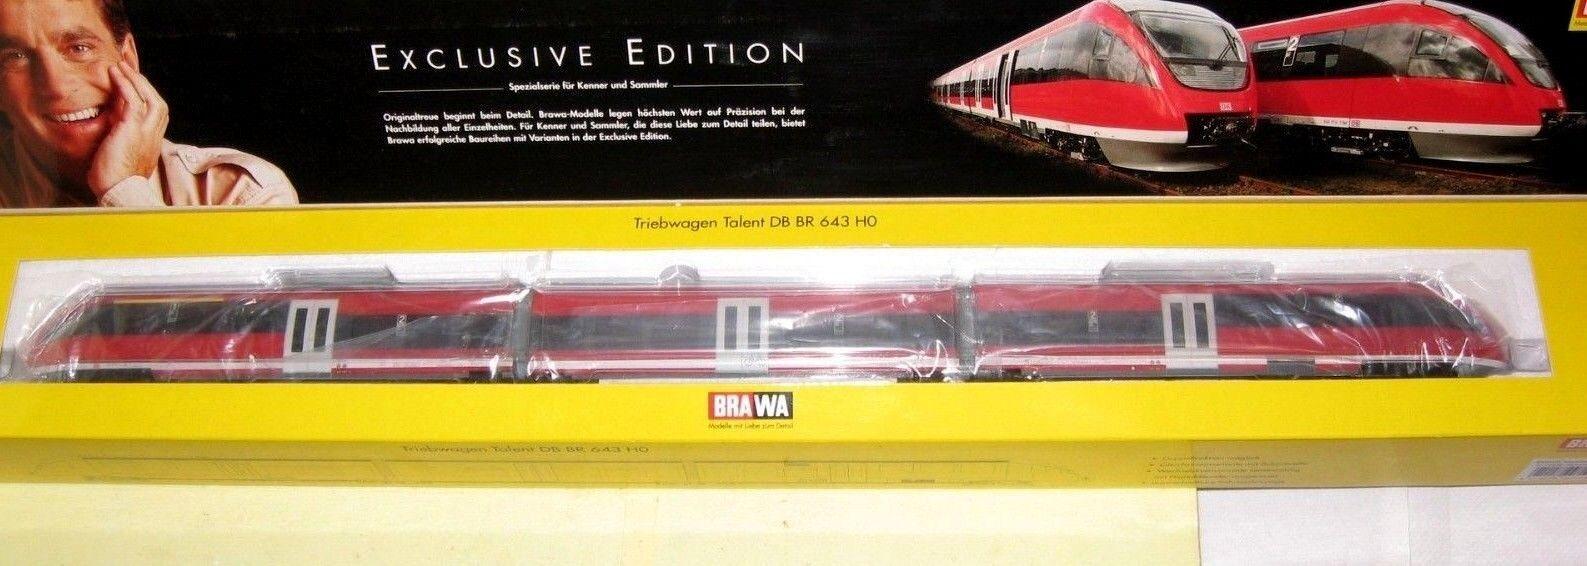 BRAWA 0710 DB  Triebwagen 643  Talent  Ep V